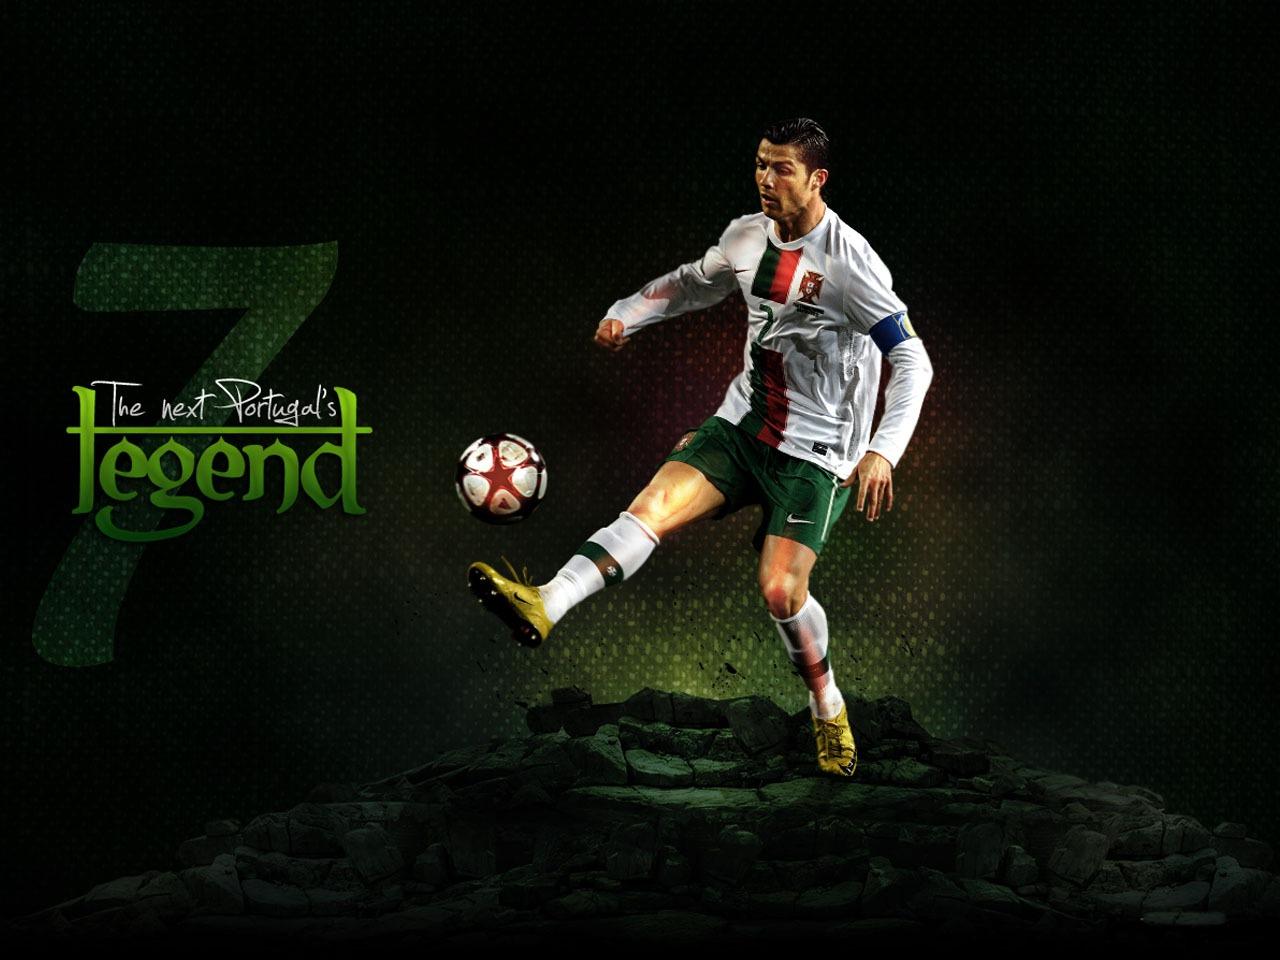 http://3.bp.blogspot.com/-qa0pOPRaPuA/UDcTiz2DrNI/AAAAAAAAAg0/294Tl_5Y2z8/s1600/Cristiano+Ronaldo+HD+Wallpapers+2012-2013+101.jpg